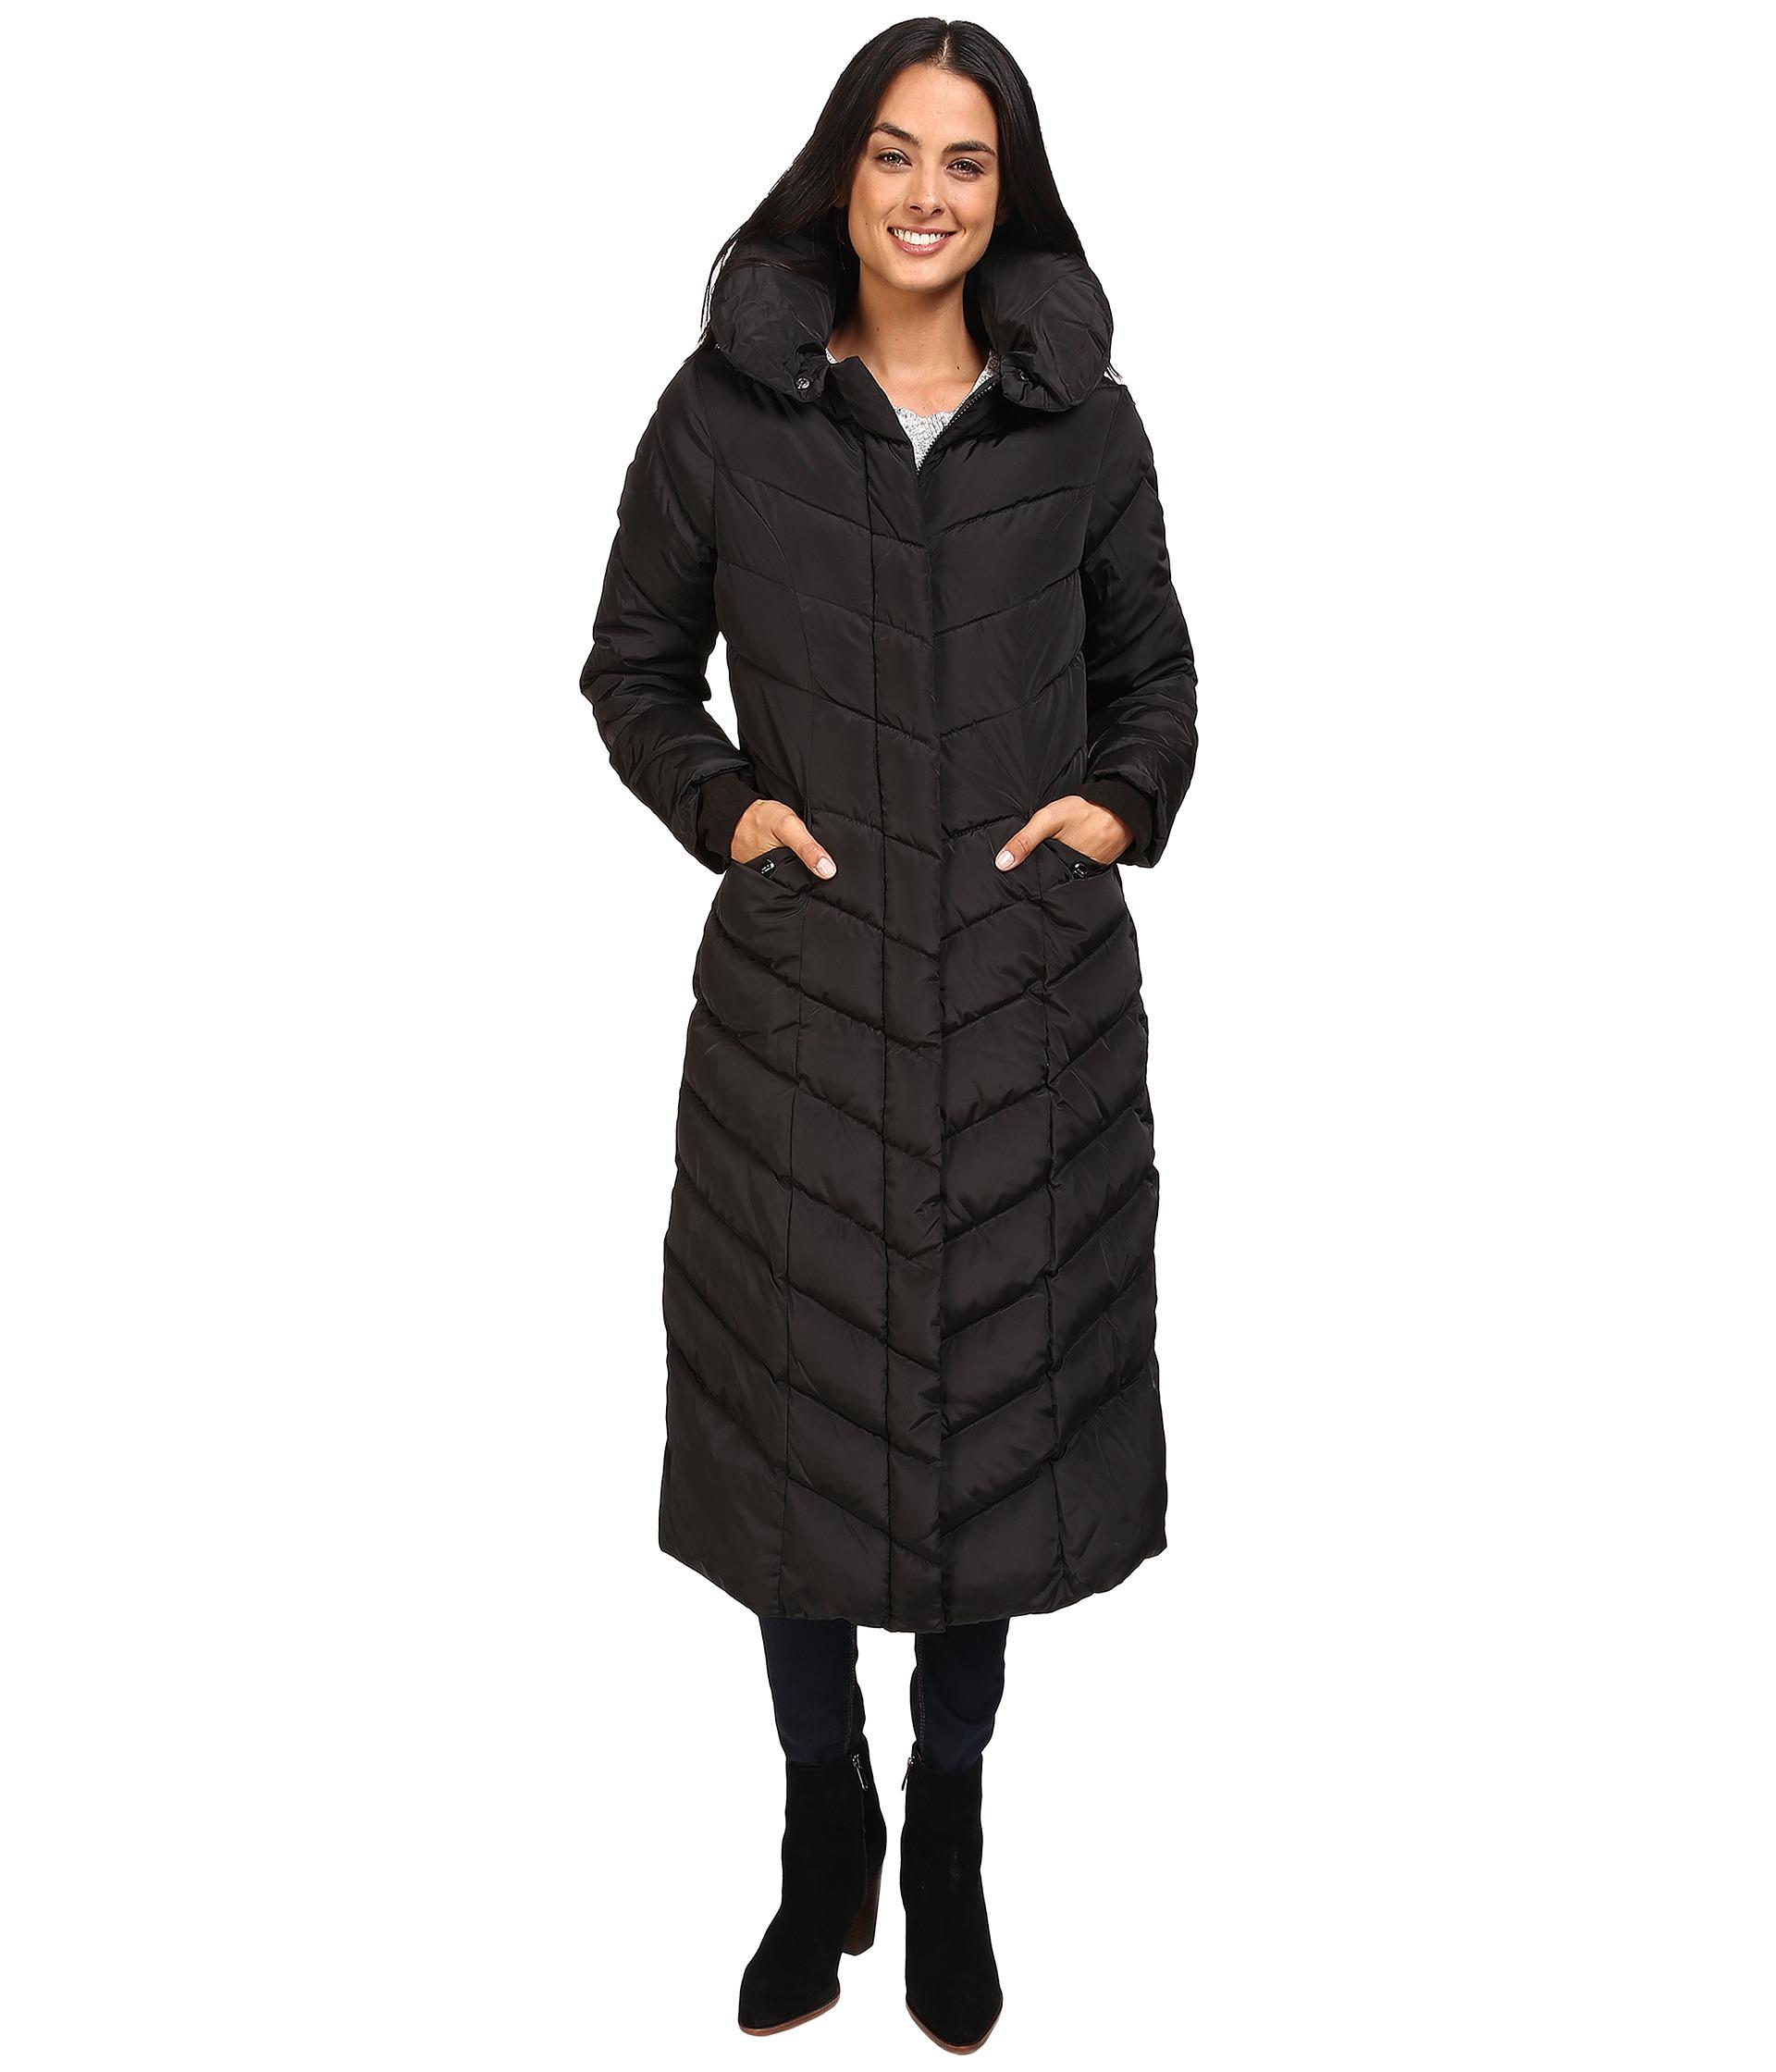 6dafb3463 Steve Madden Women's Maxi Hooded Chevron Puffer Coat - Black - Size ...